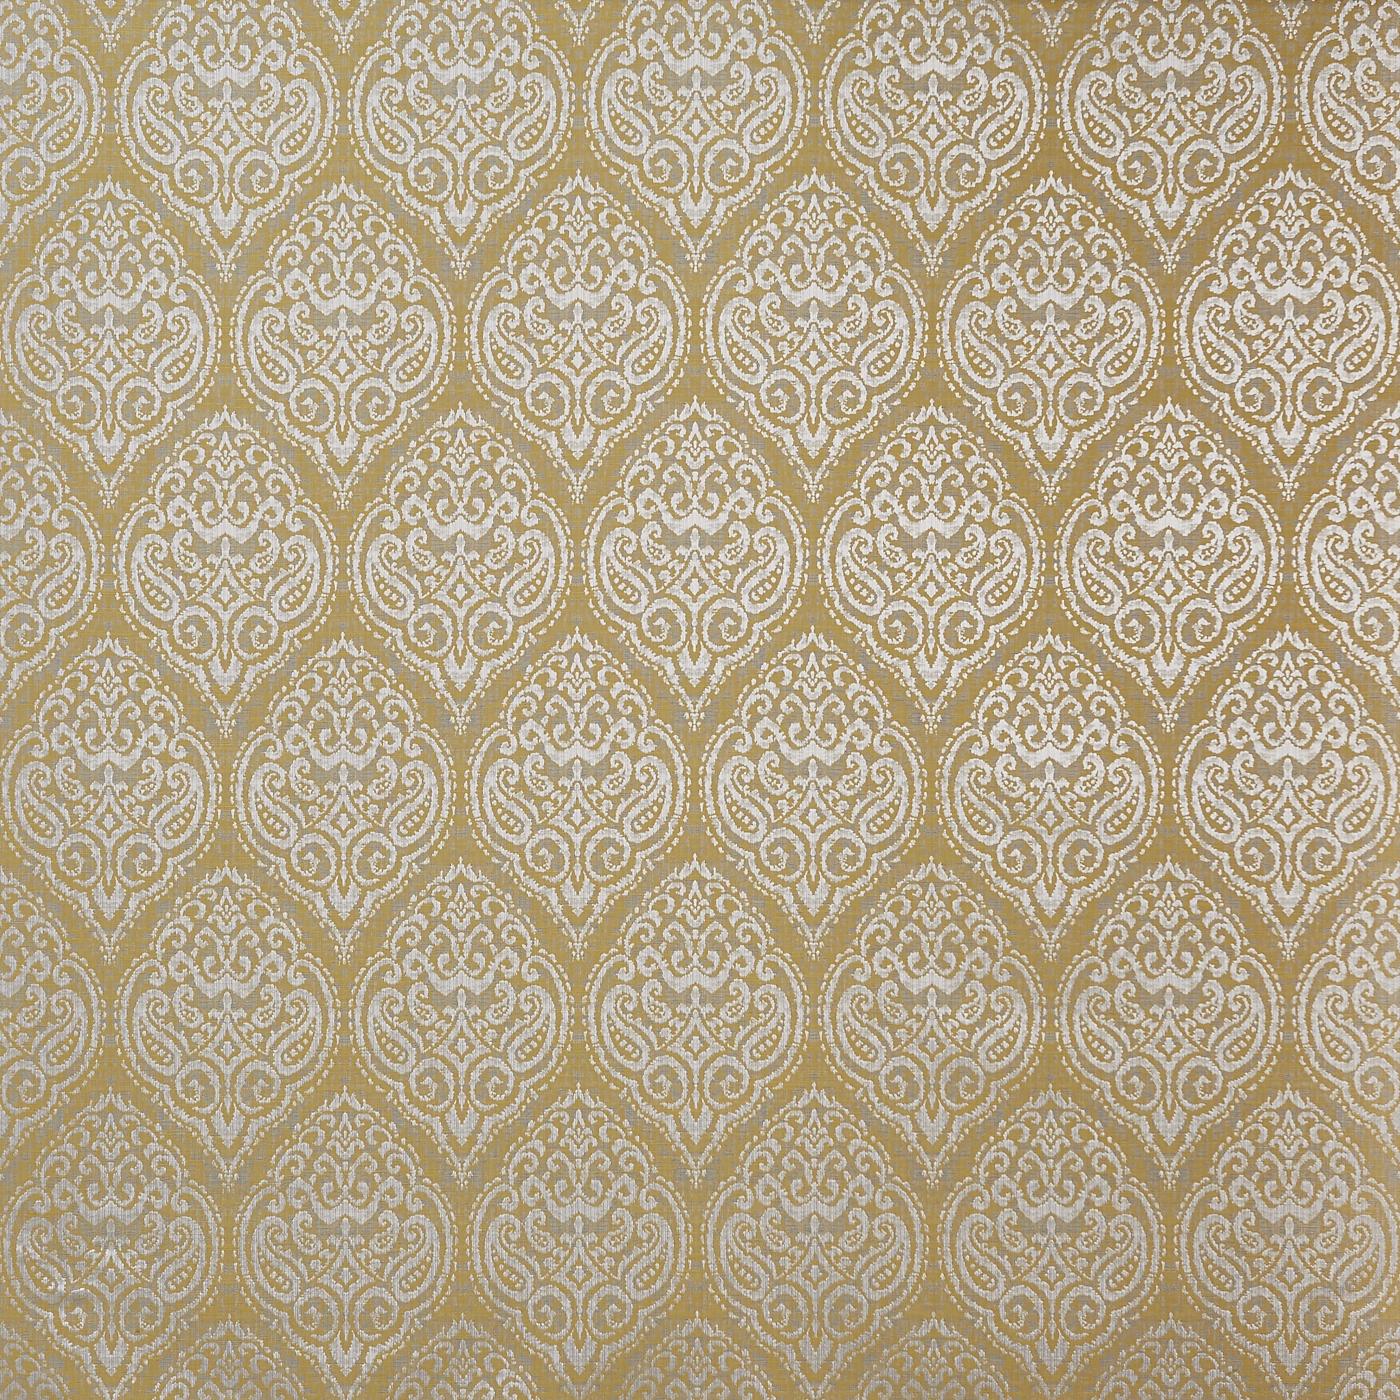 Emotion Ochre Fabric Illusion Prestigious Textiles